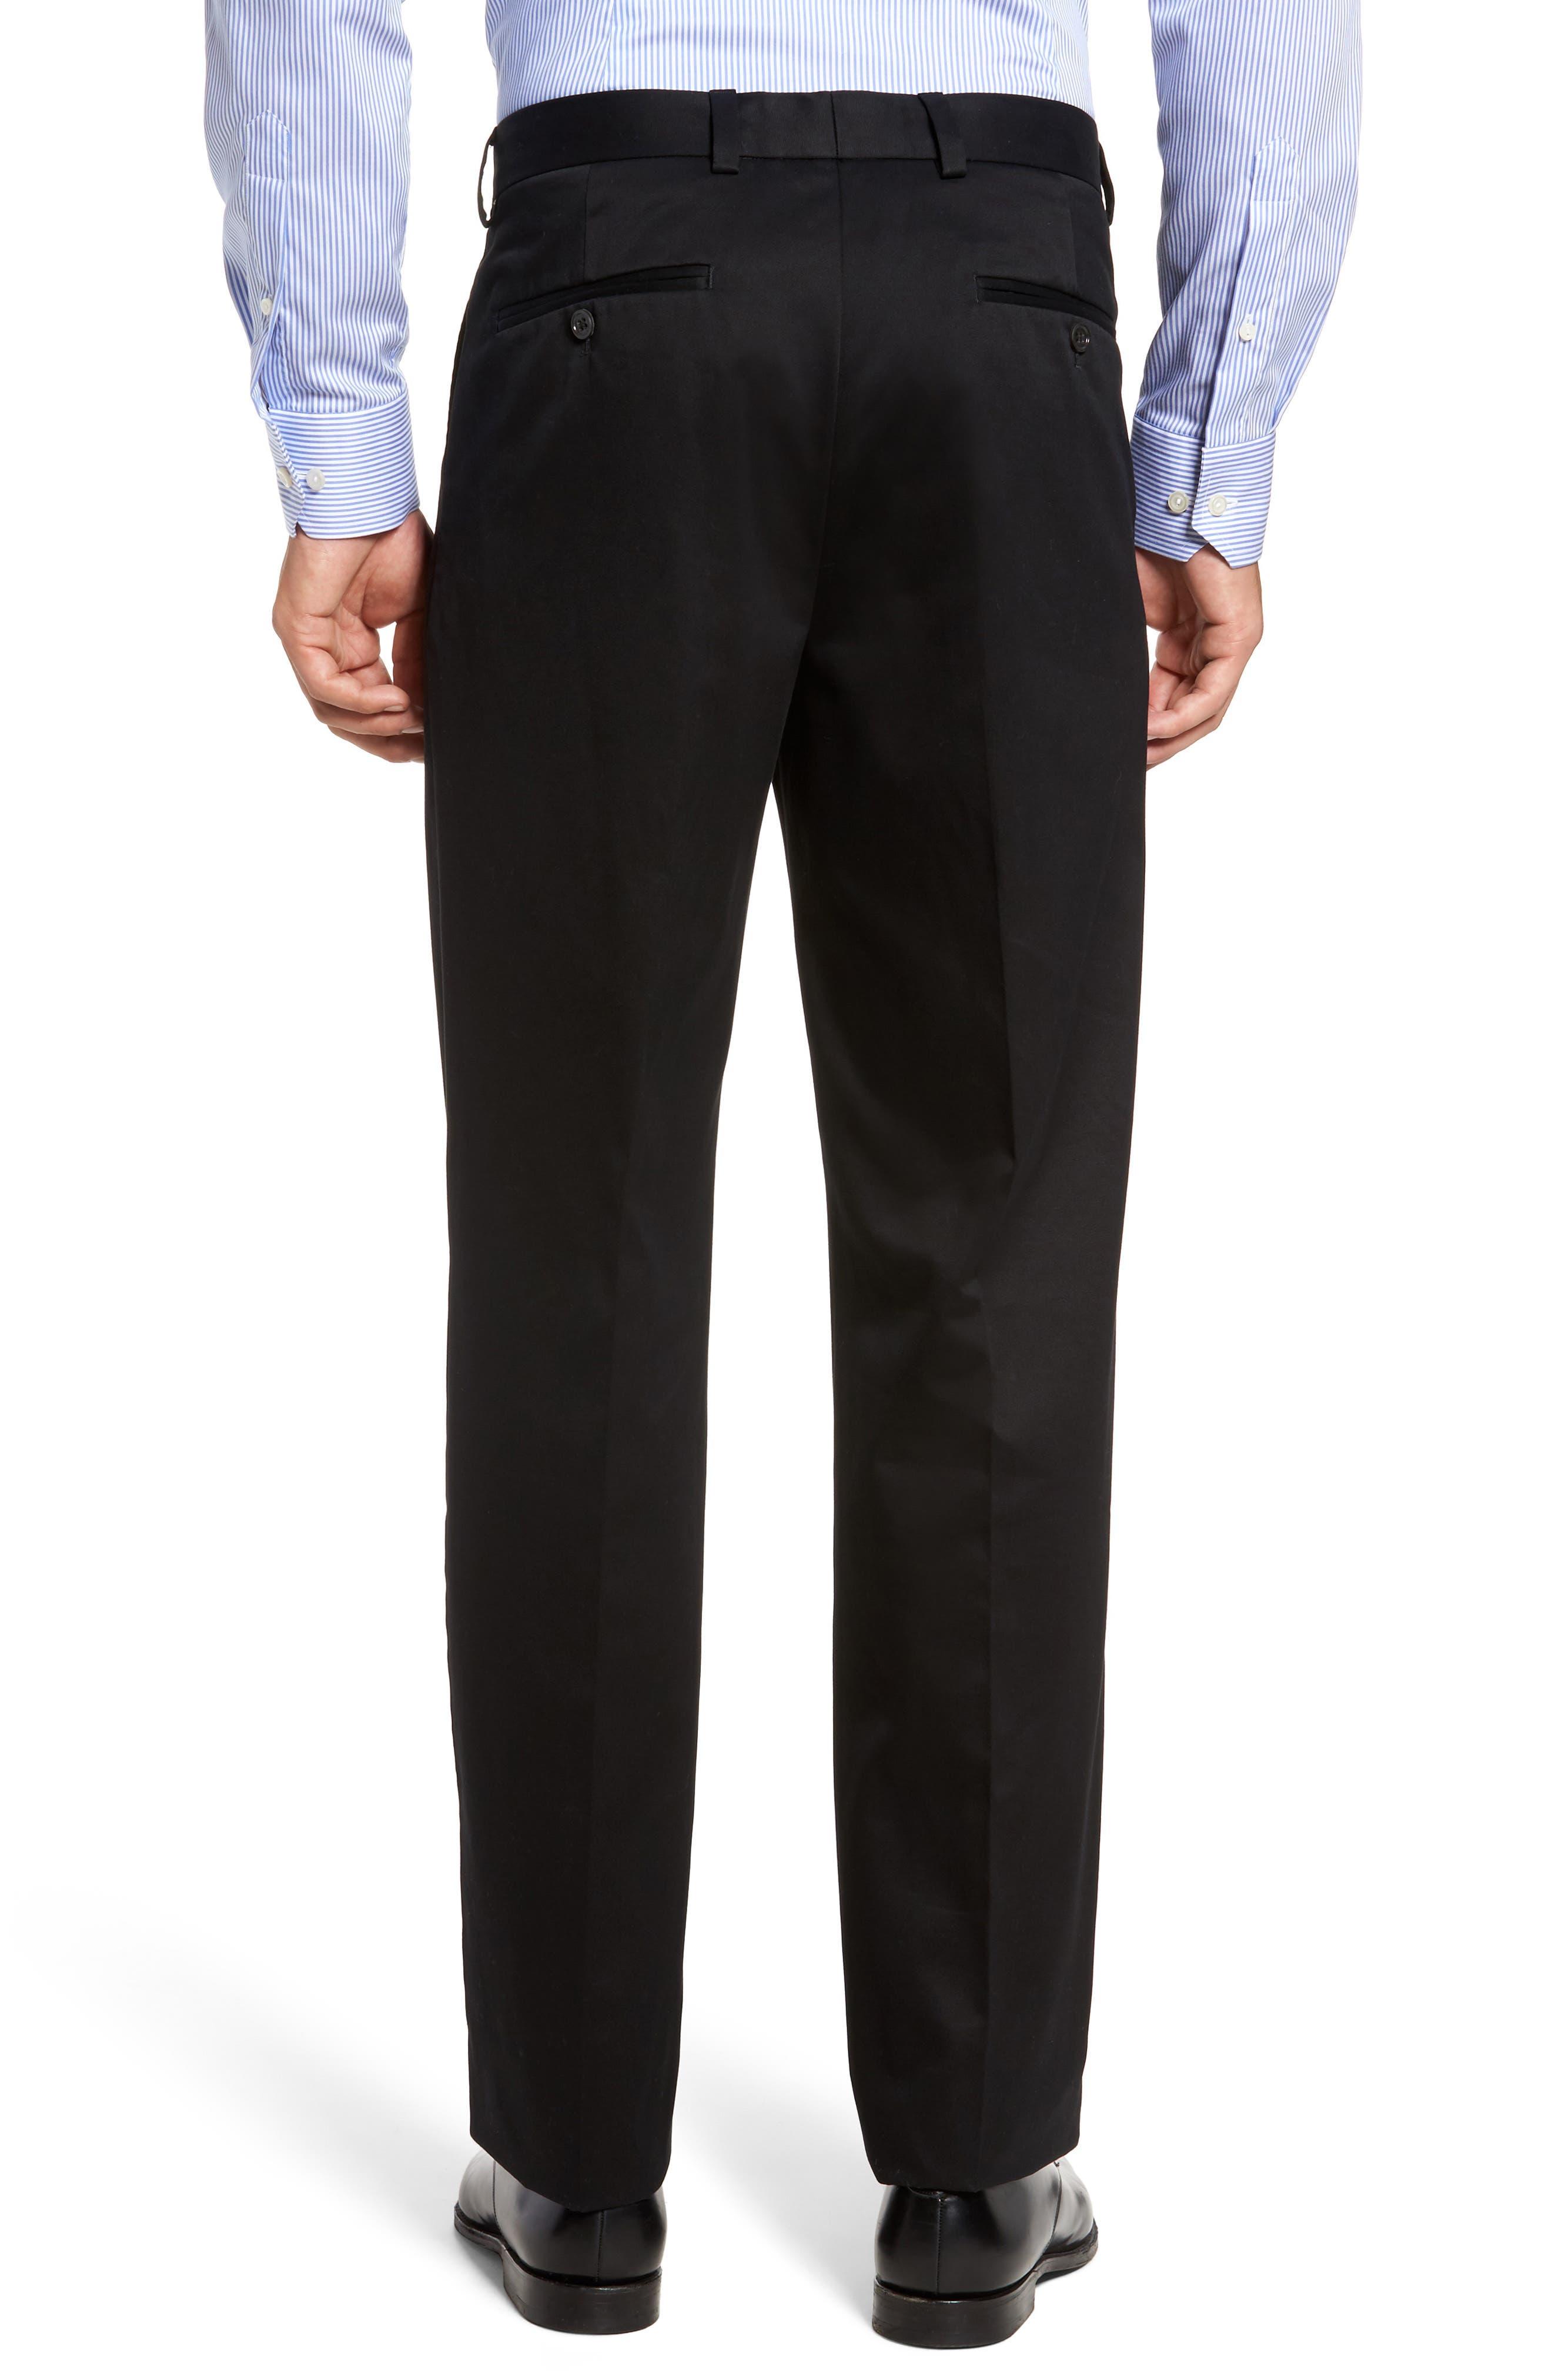 NORDSTROM MEN'S SHOP, 'Classic' Smartcare<sup>™</sup> Relaxed Fit Double Pleated Cotton Pants, Alternate thumbnail 2, color, BLACK